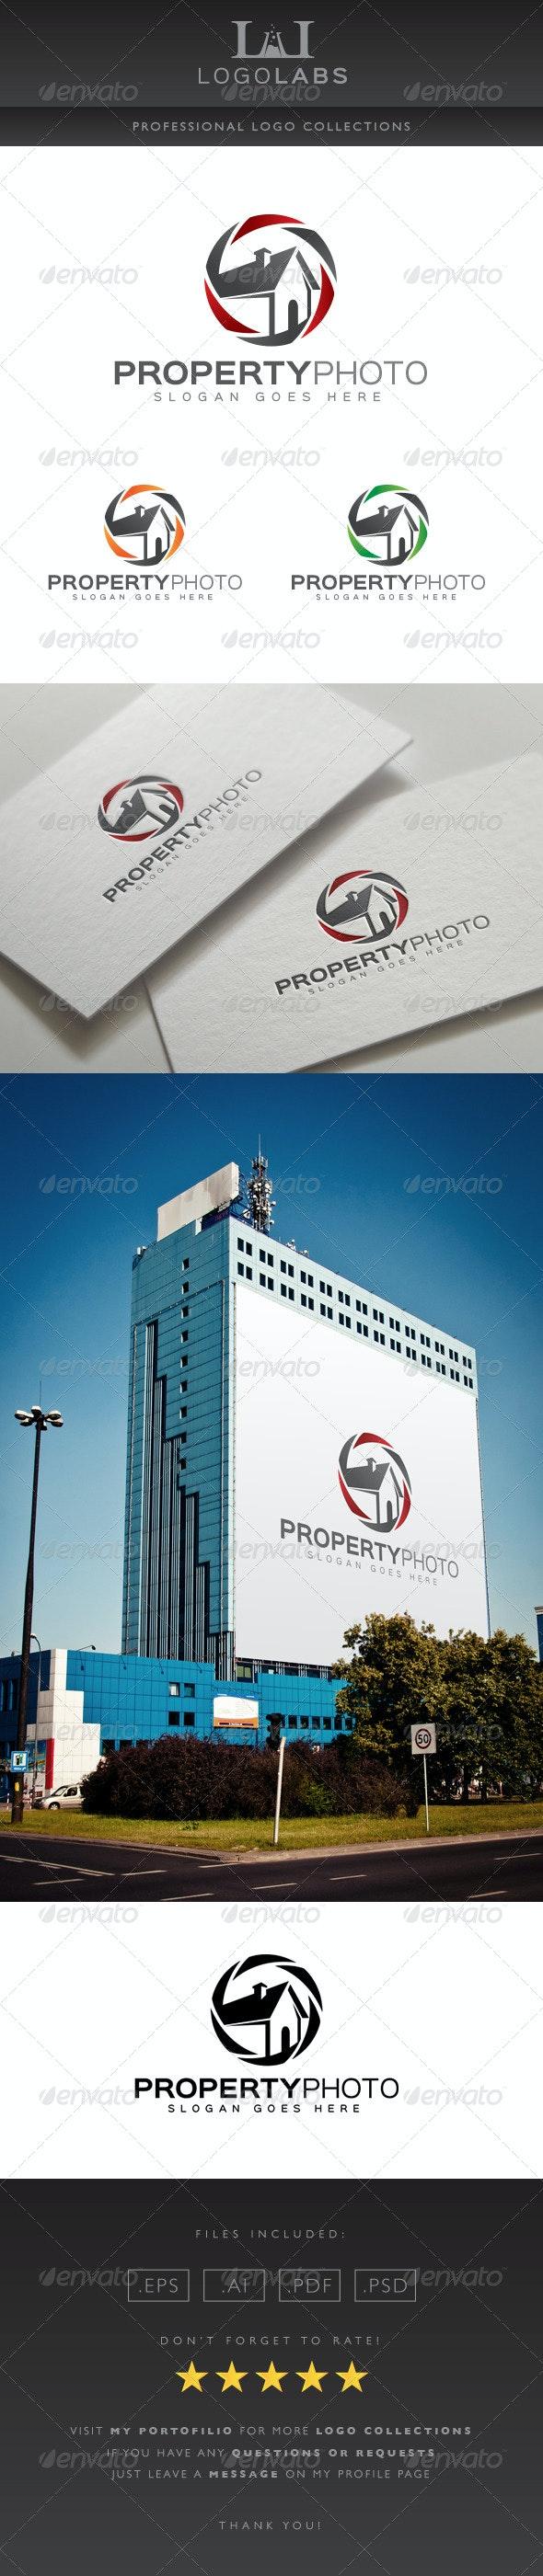 Property Photo - Buildings Logo Templates